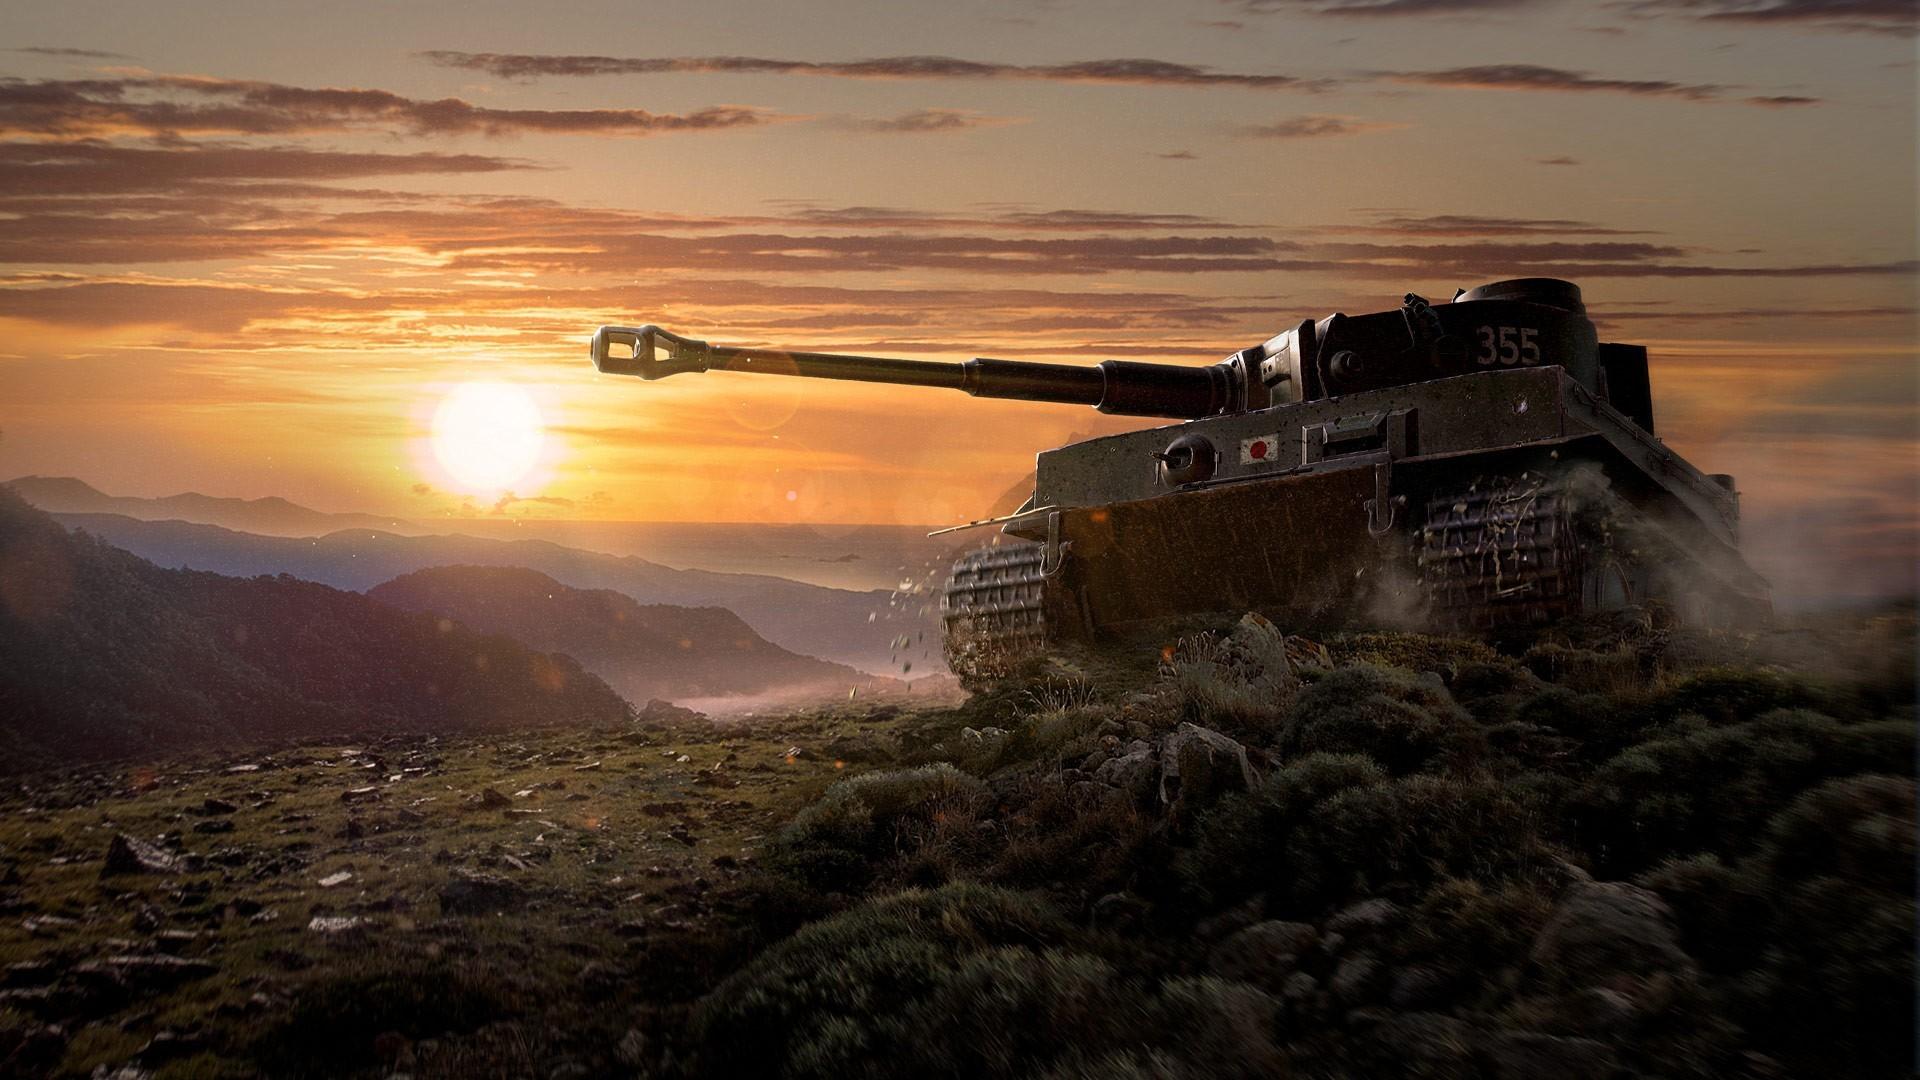 world of tanks hd wallpaper background image 1920x1080